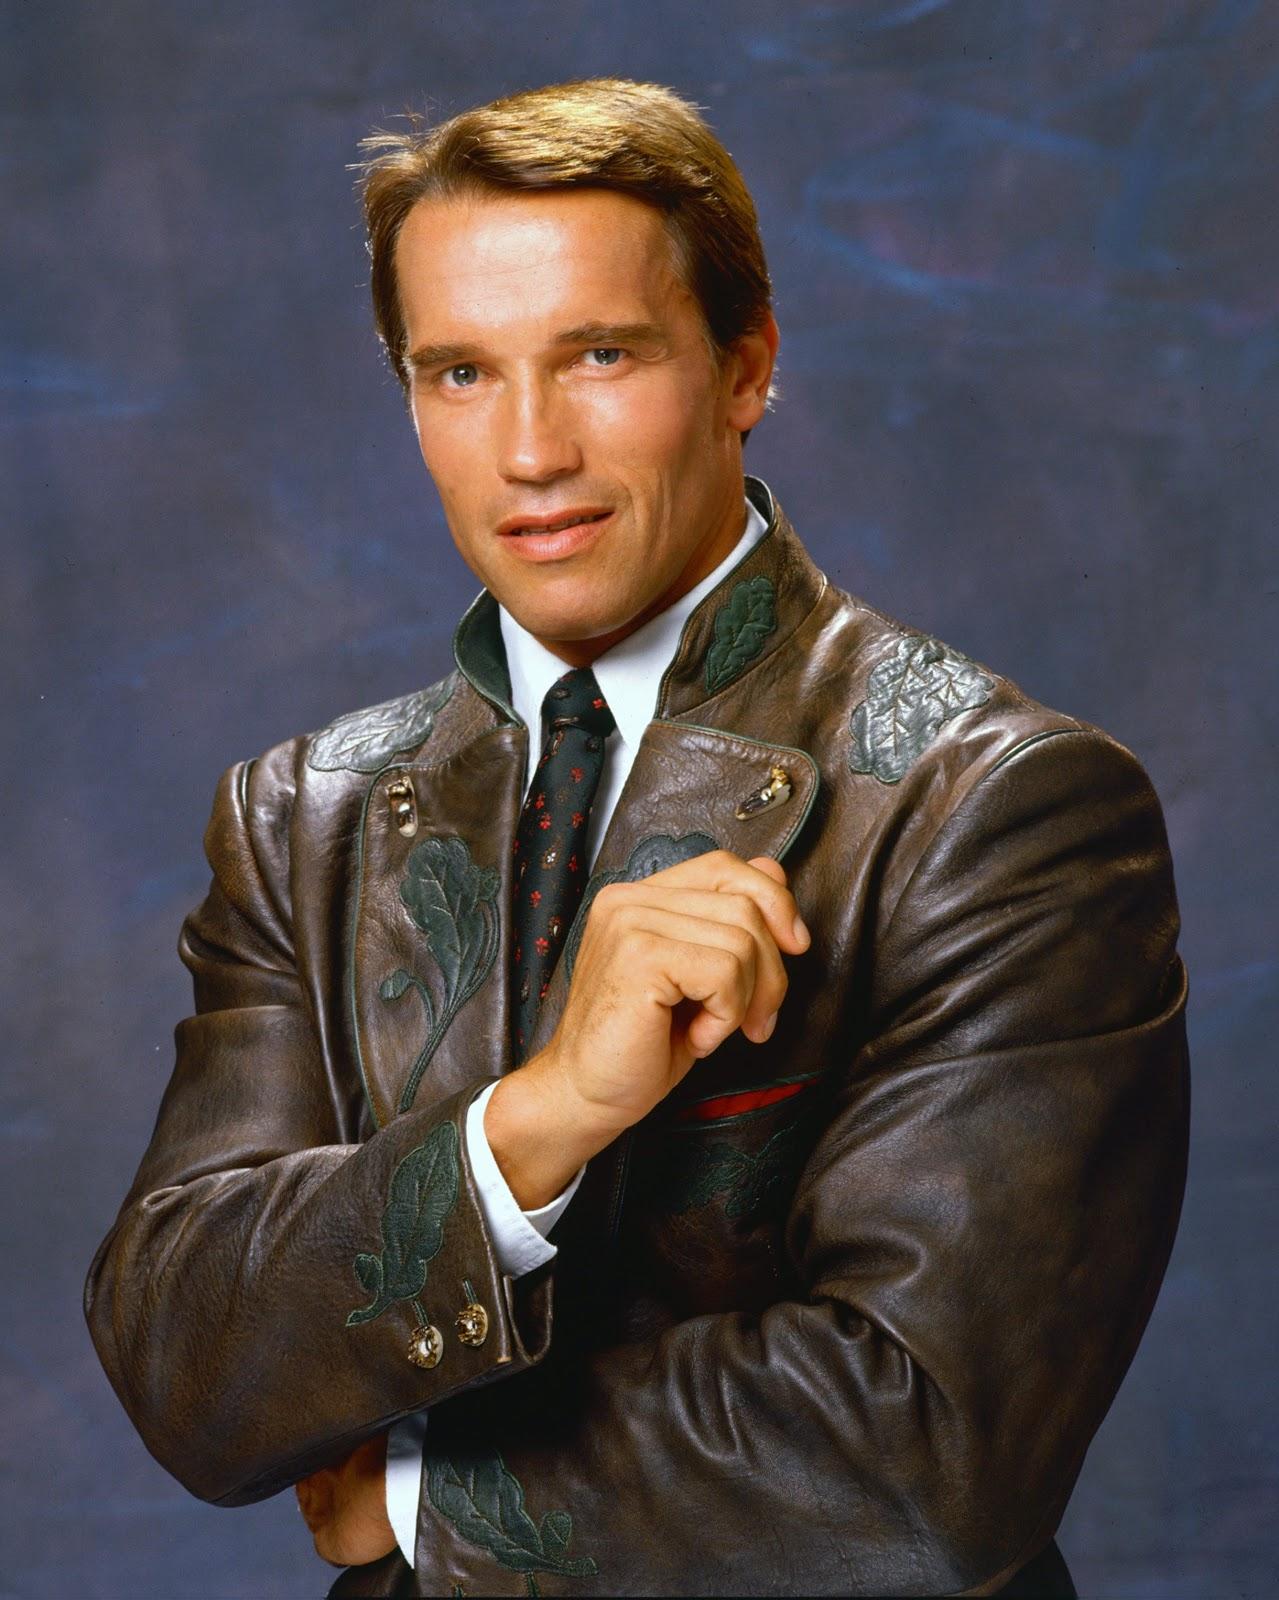 http://4.bp.blogspot.com/-5wSrwe56sUc/TyGZzGZCMBI/AAAAAAAAItU/WRywIkfKro8/s1600/Arnold+Schwarzenegger+12.jpg